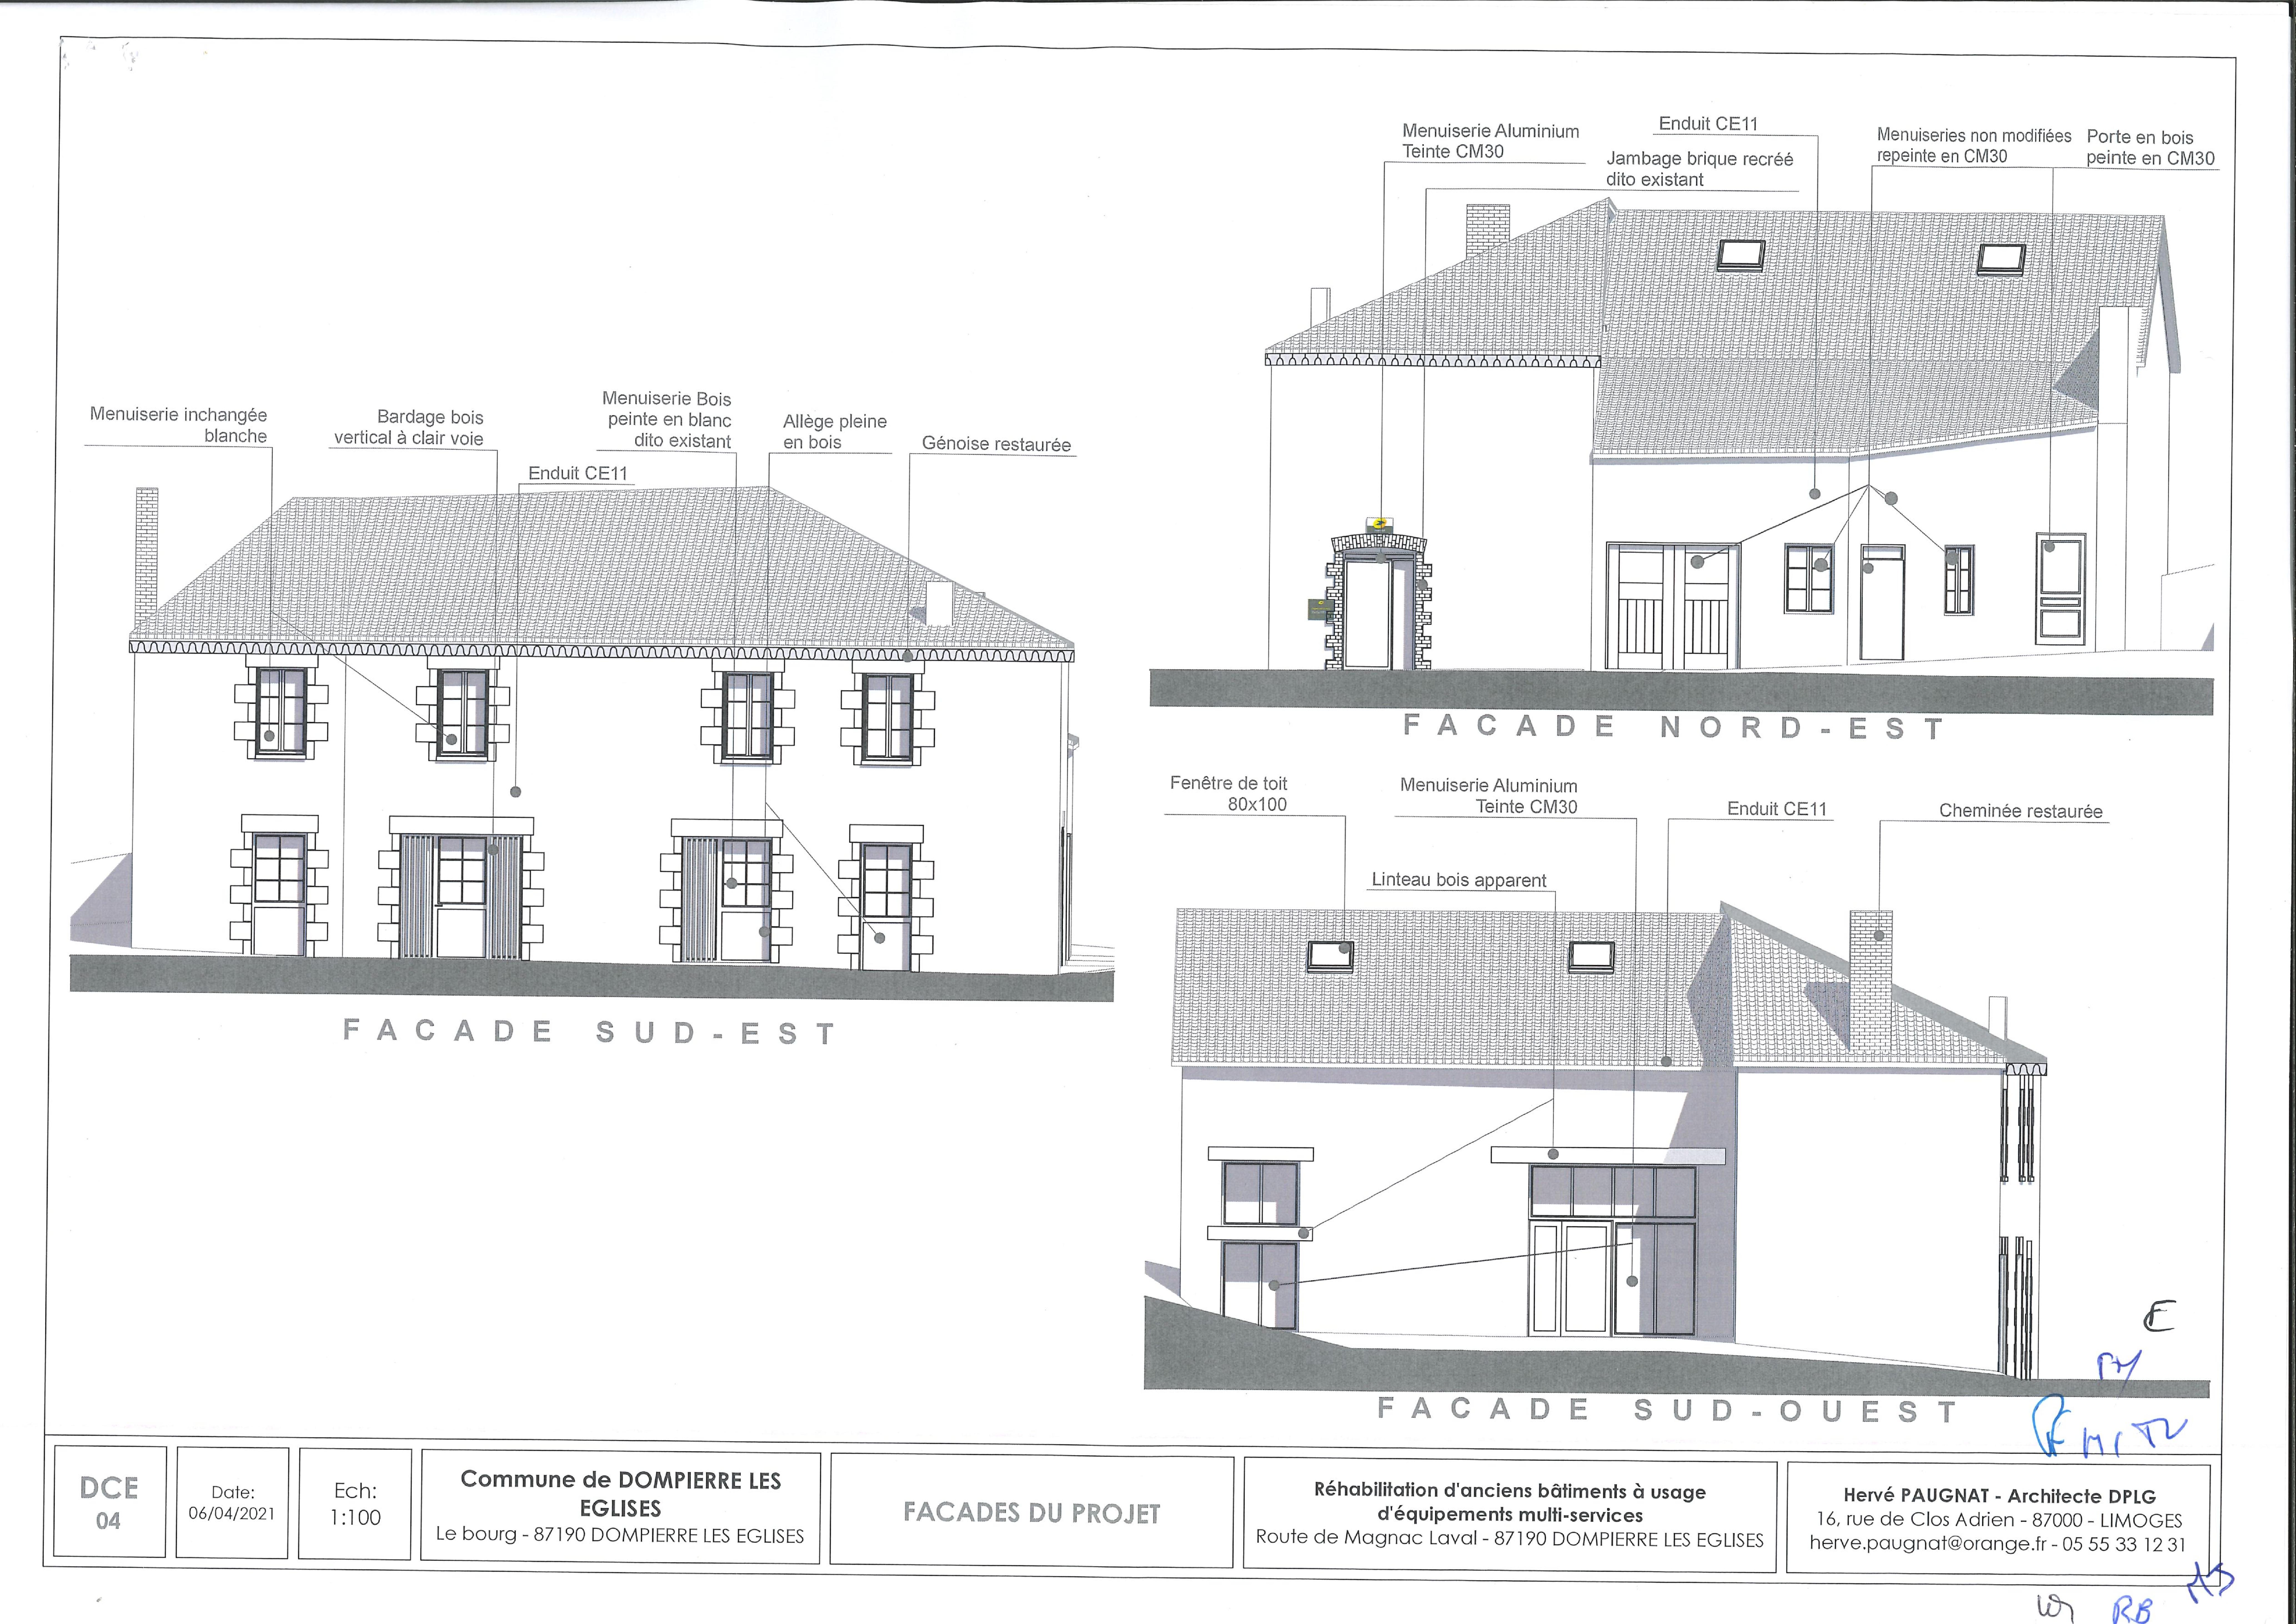 Plan projet multi-services-002-002.jpg